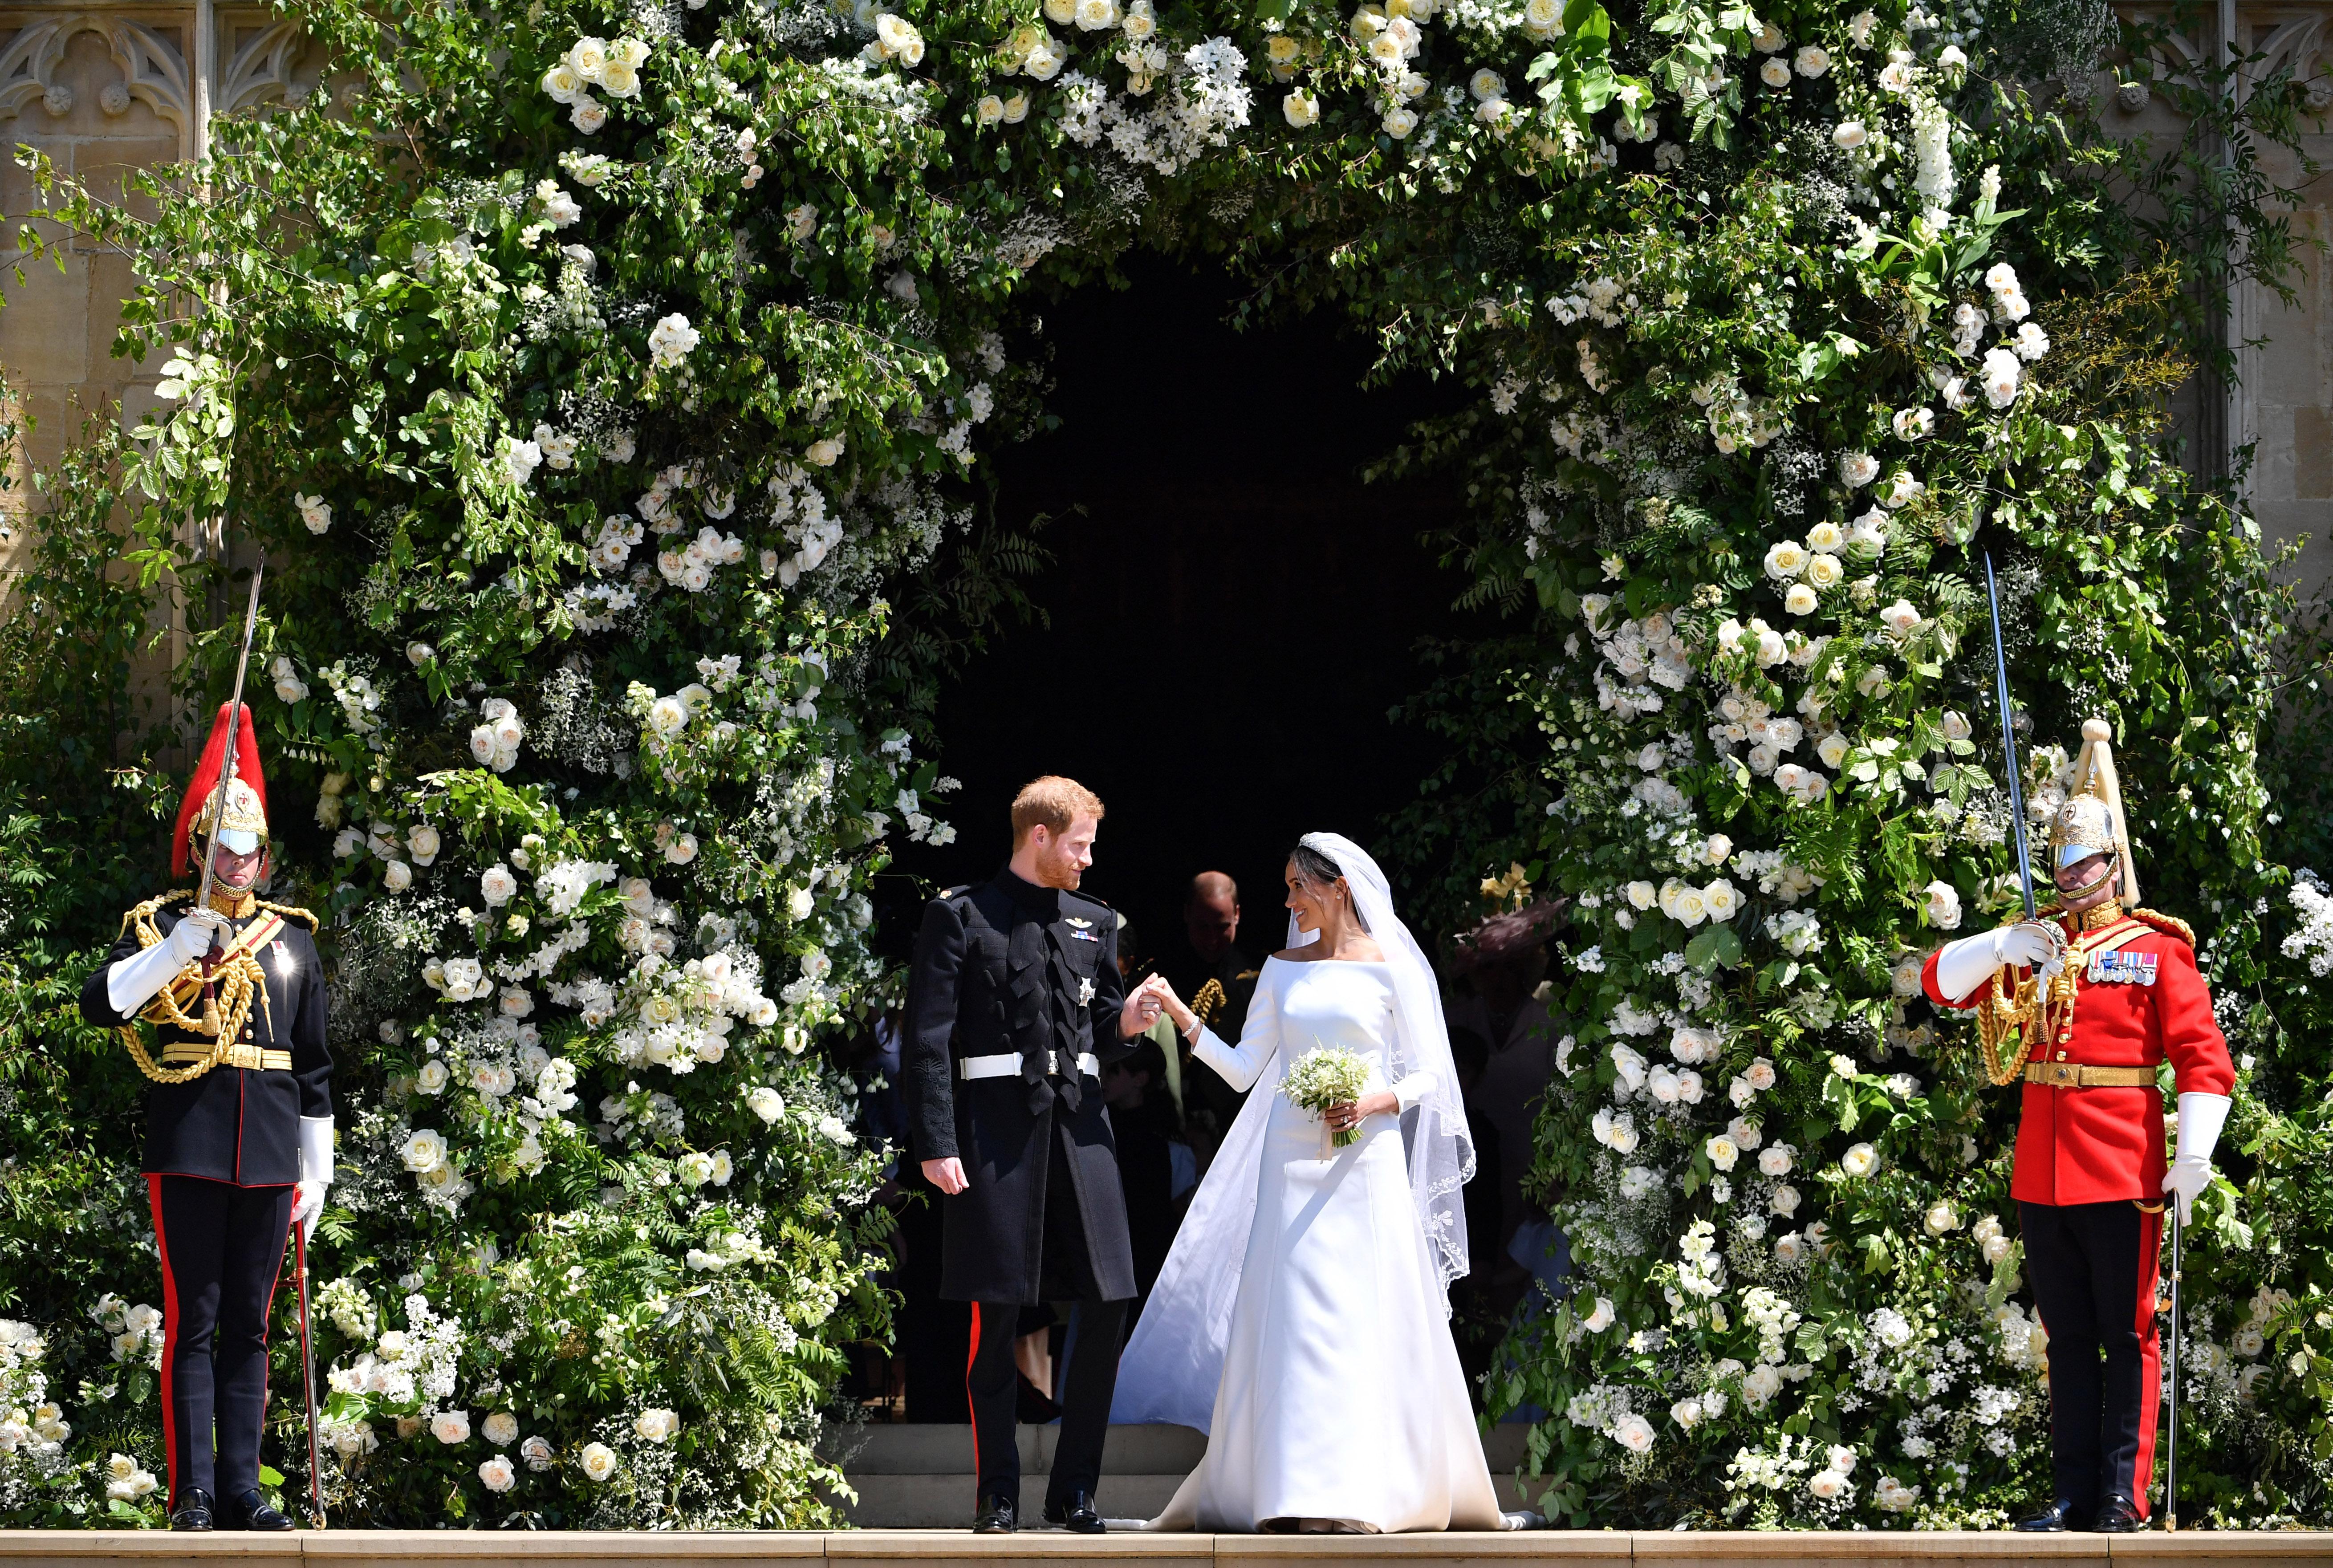 Prince Harry and Meghan Markle recessional royal wedding 2018